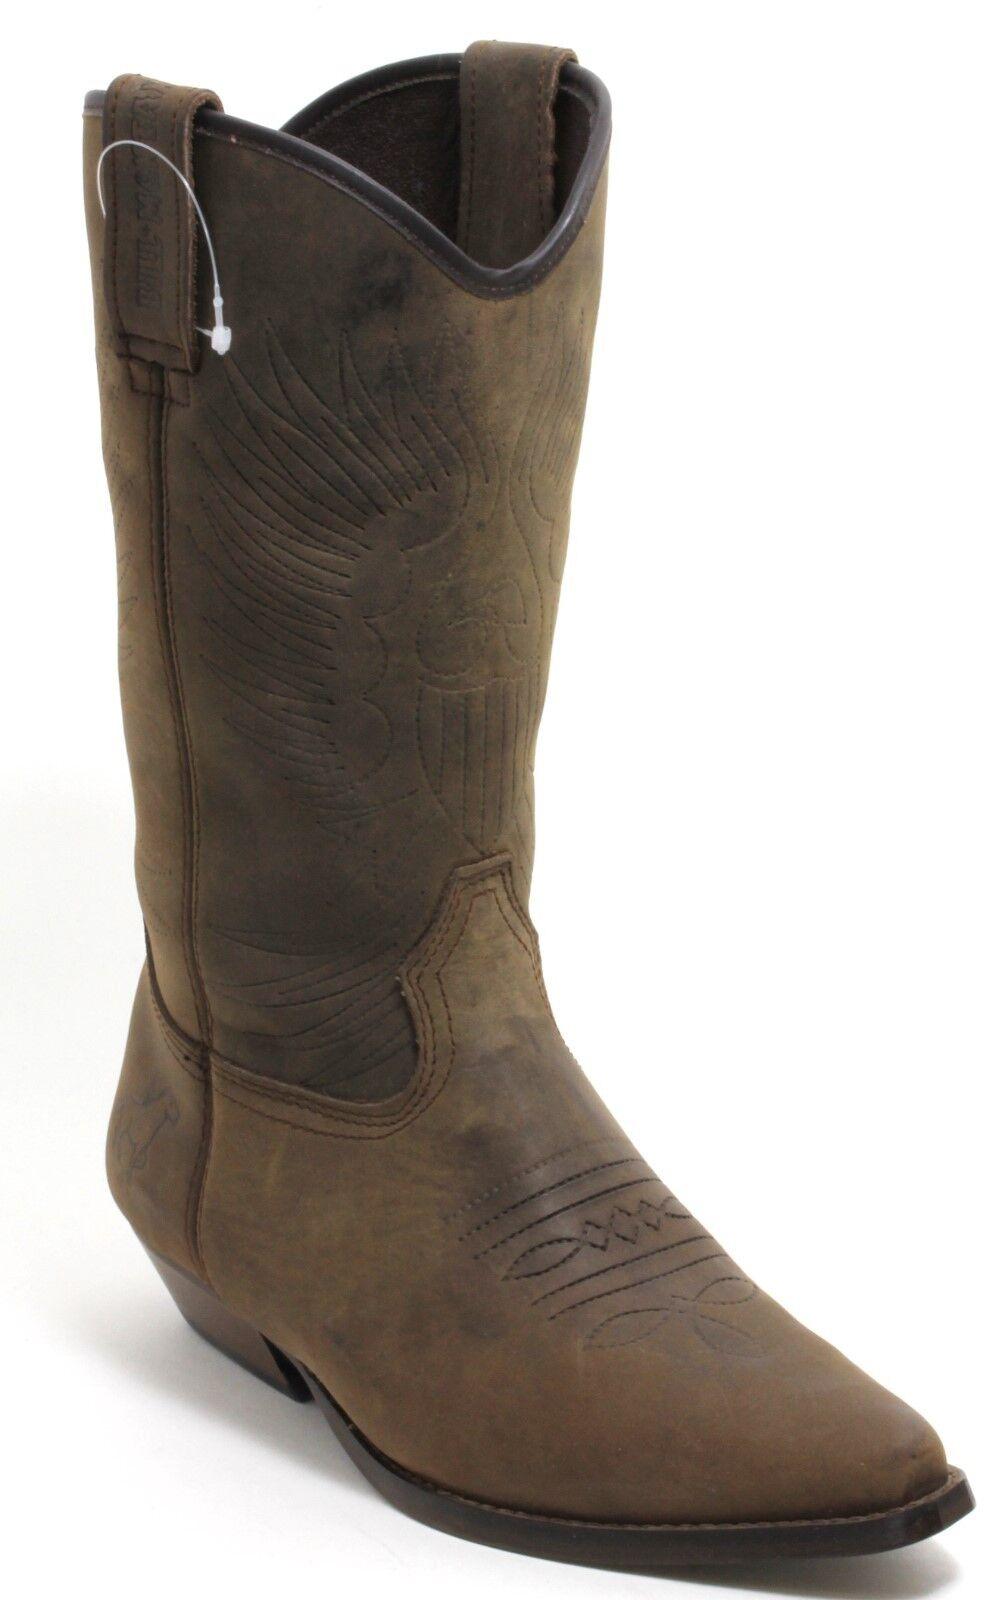 146 botas de vaquero Western botas botas botas texas botas solchaga style bill Montana 38  Venta en línea de descuento de fábrica